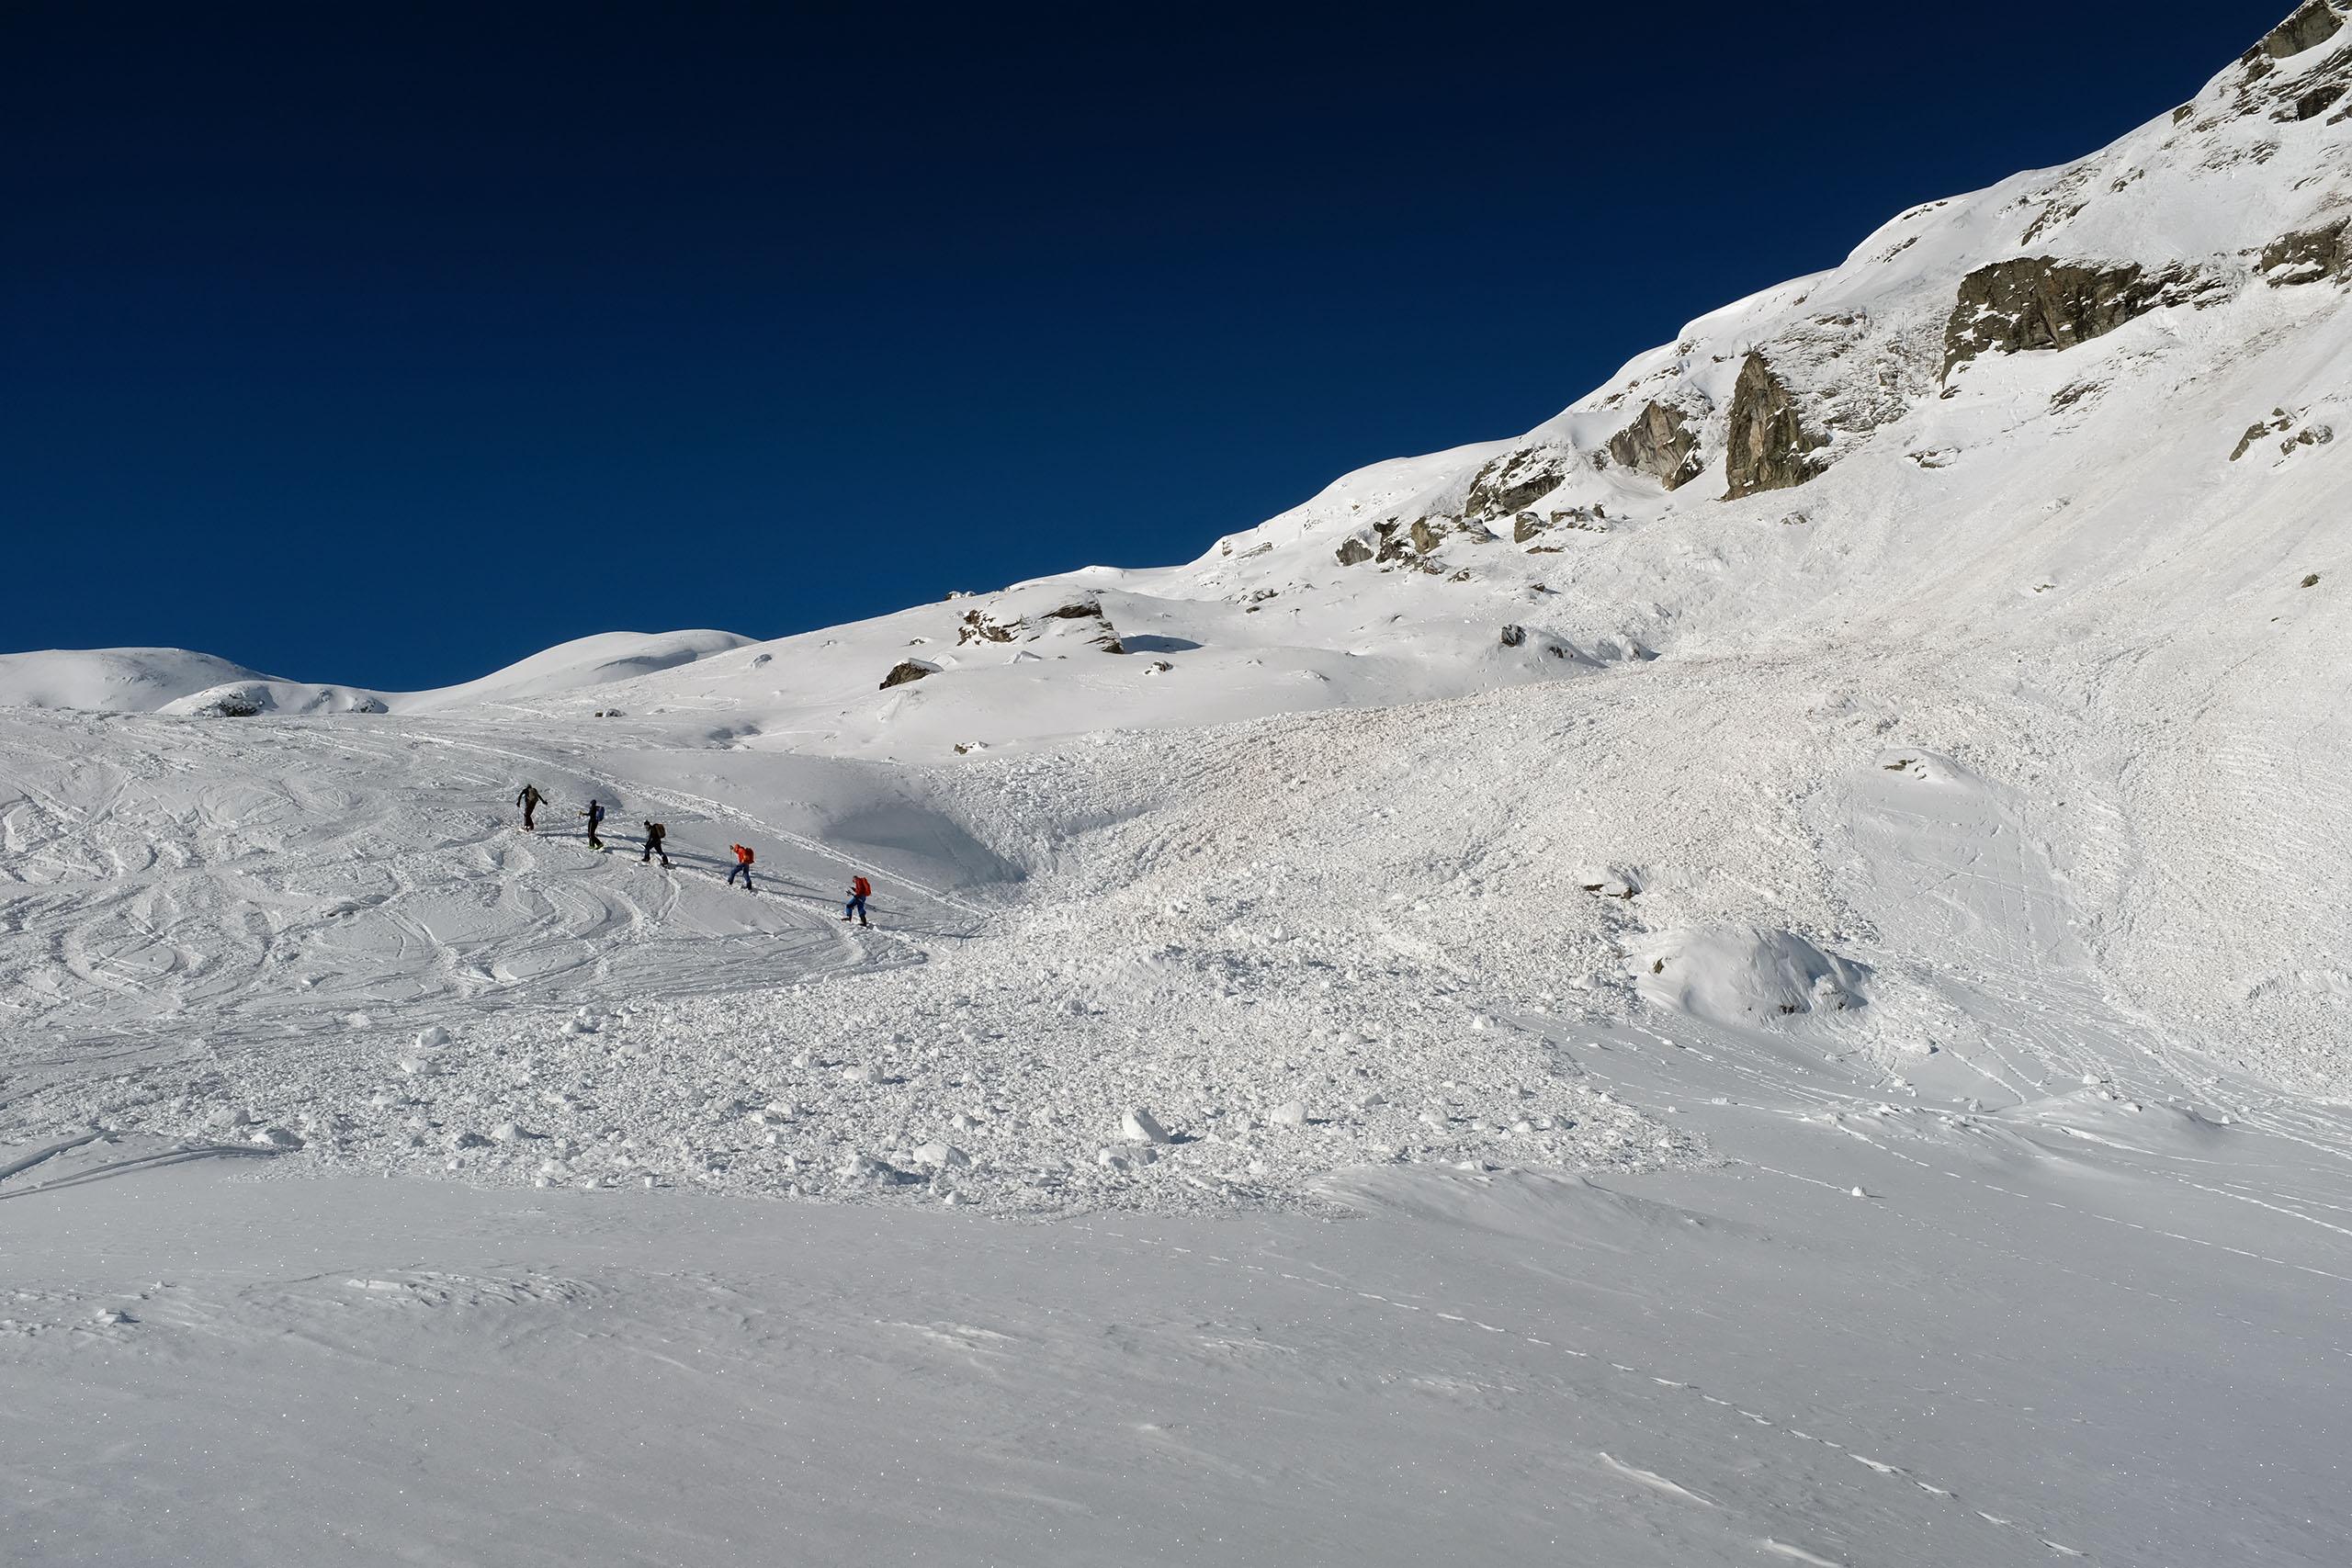 Scialpinismo al Piz Scalotta: valanga scesa dal Crap da Radons